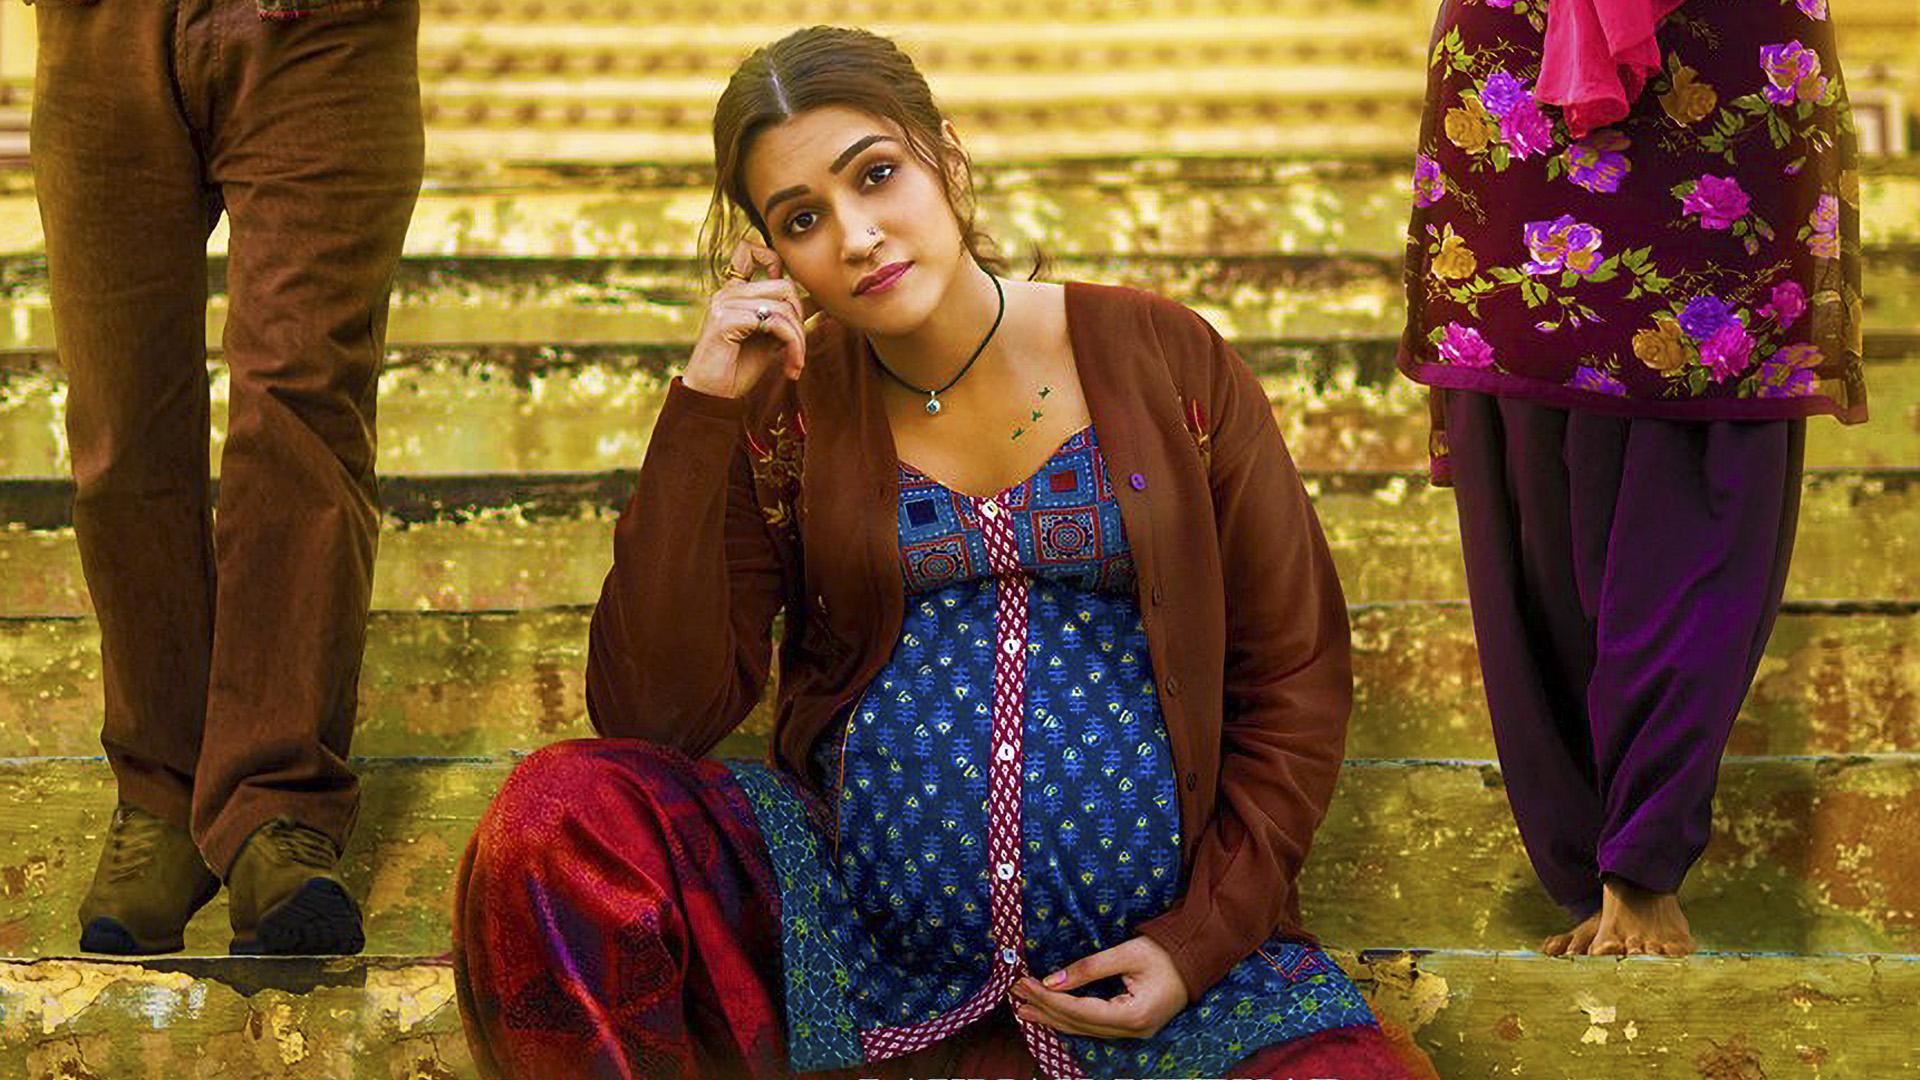 Kriti Sanon's 'Mimi' Gets Release Date, Film To Premiere On Netflix, Jio Cinema